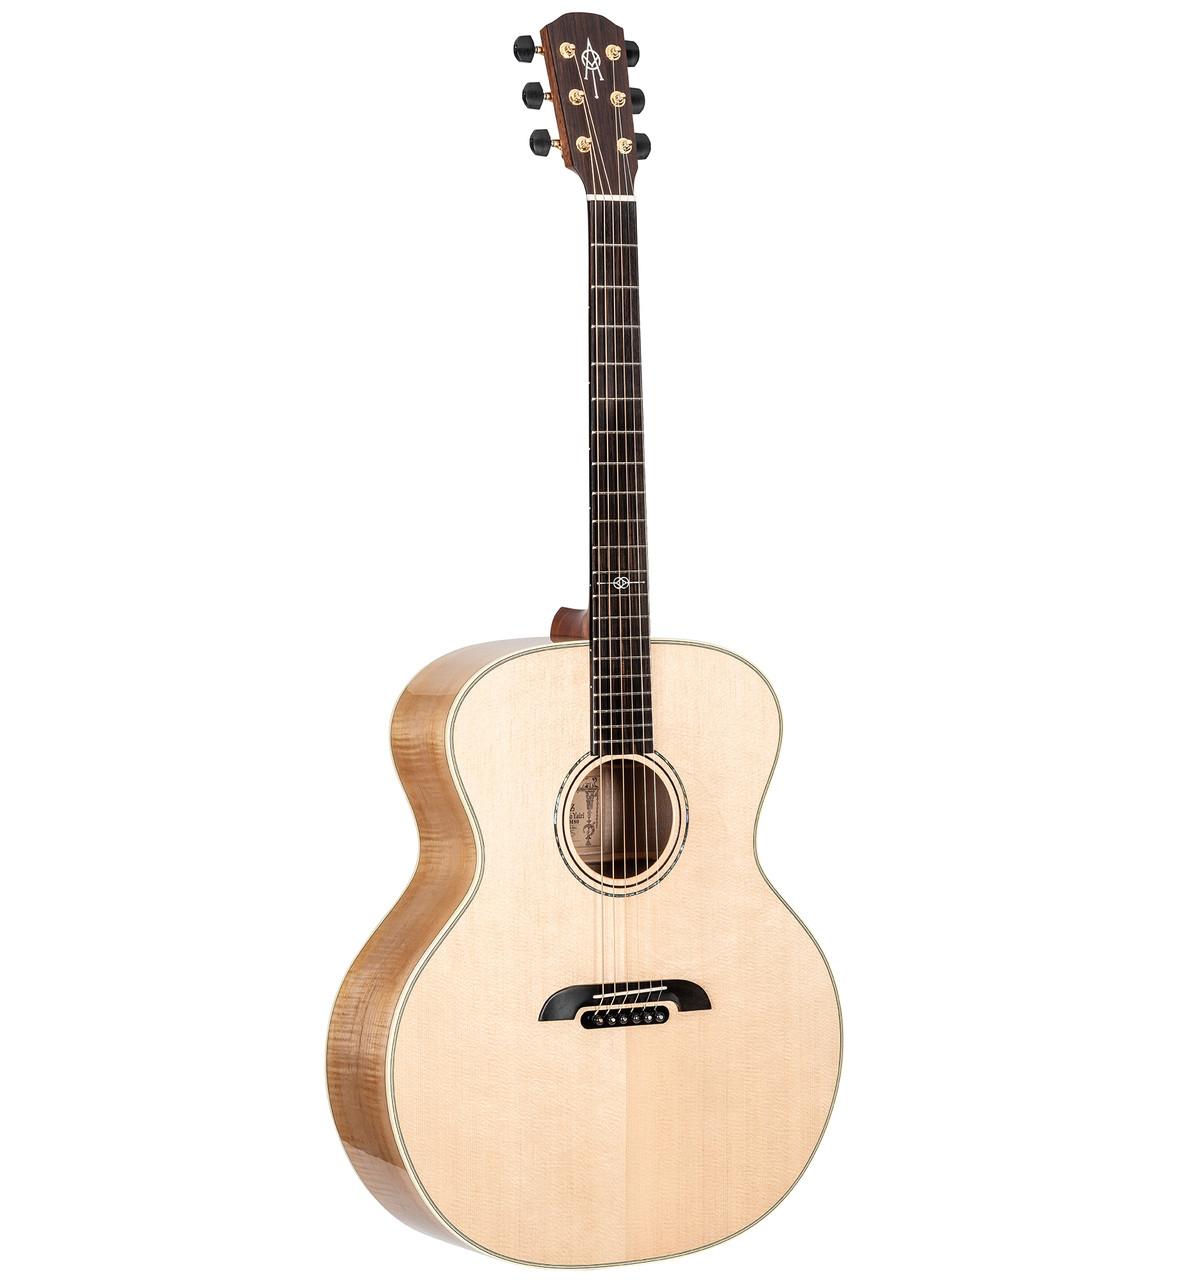 Alvarez Yairi JYM80 Masterworks Jumbo Acoustic Guitar